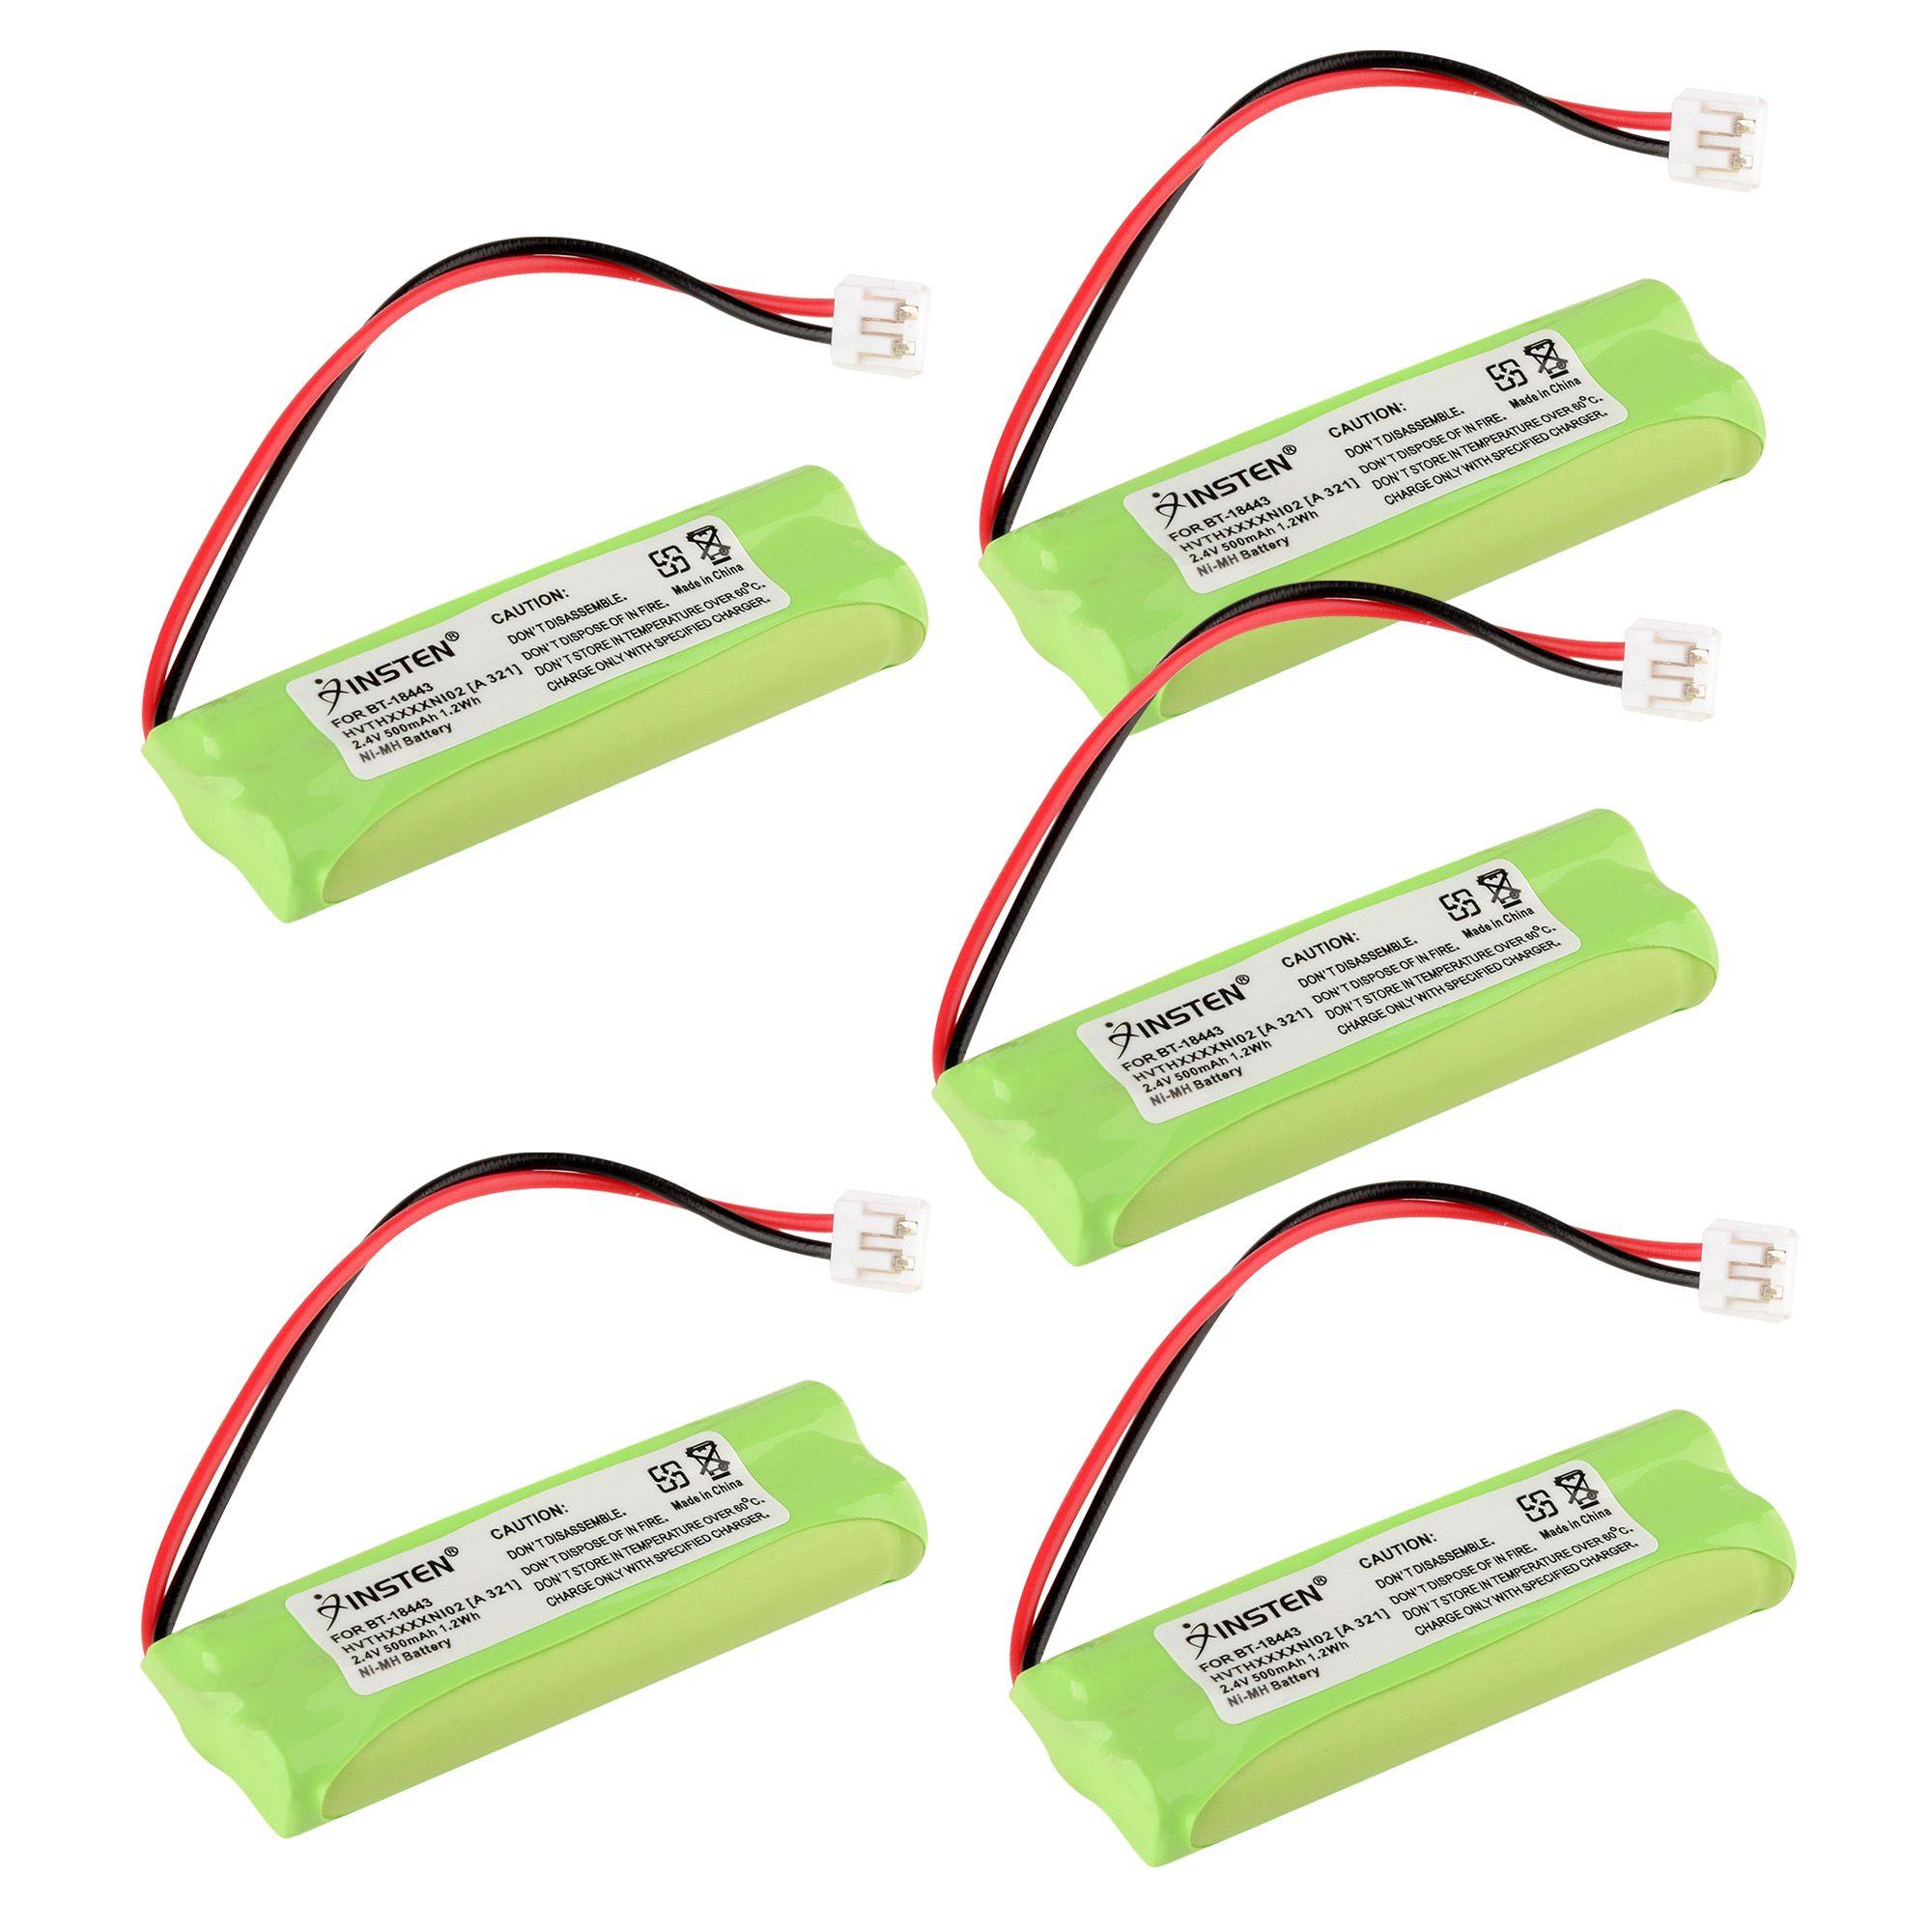 Insten Extra Ni-Mh Cordless Phone Battery Power For Vtech BT-18443 6115 6117 6125 6126 6217 89-1337-00-00 (5 Pack)